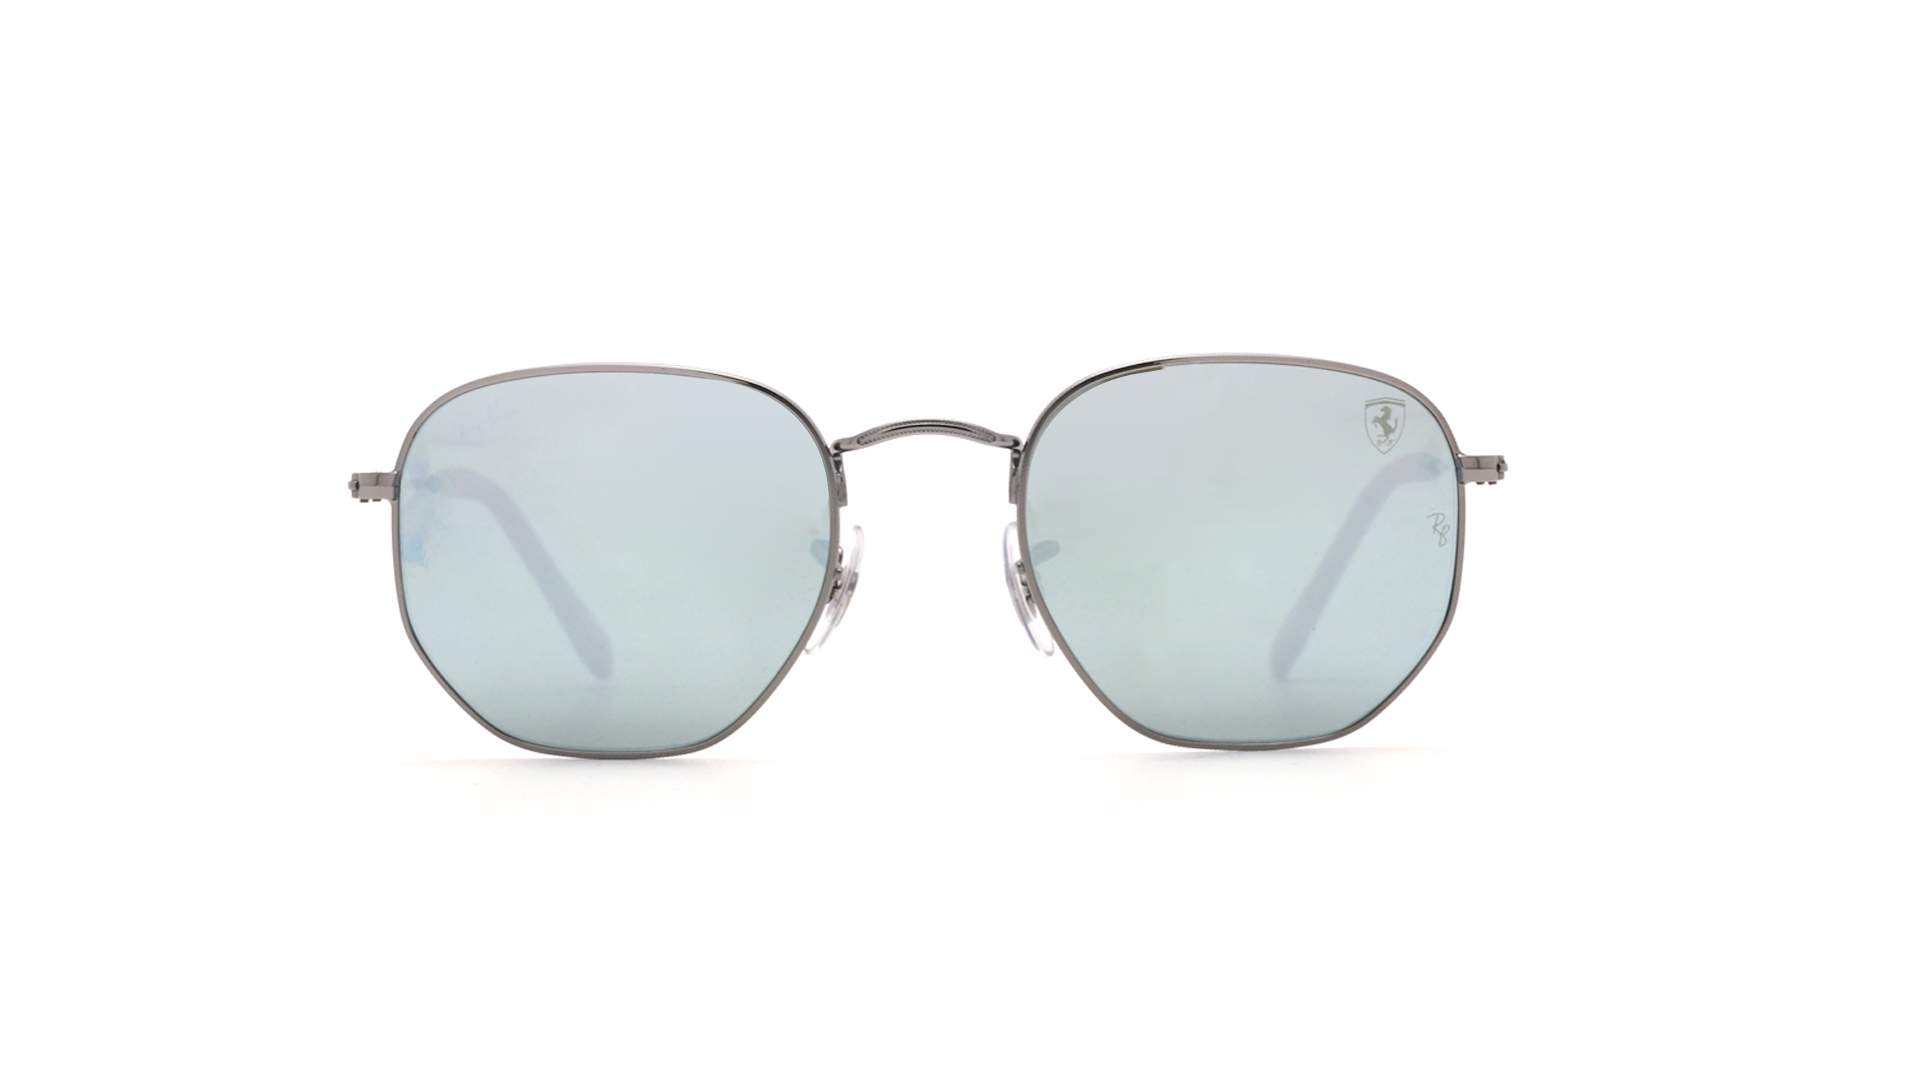 283e12ee21f Sunglasses Ray-Ban Hexagonal Scuderia Ferrari Silver RB3548NM F001 30 51-21  Medium Mirror